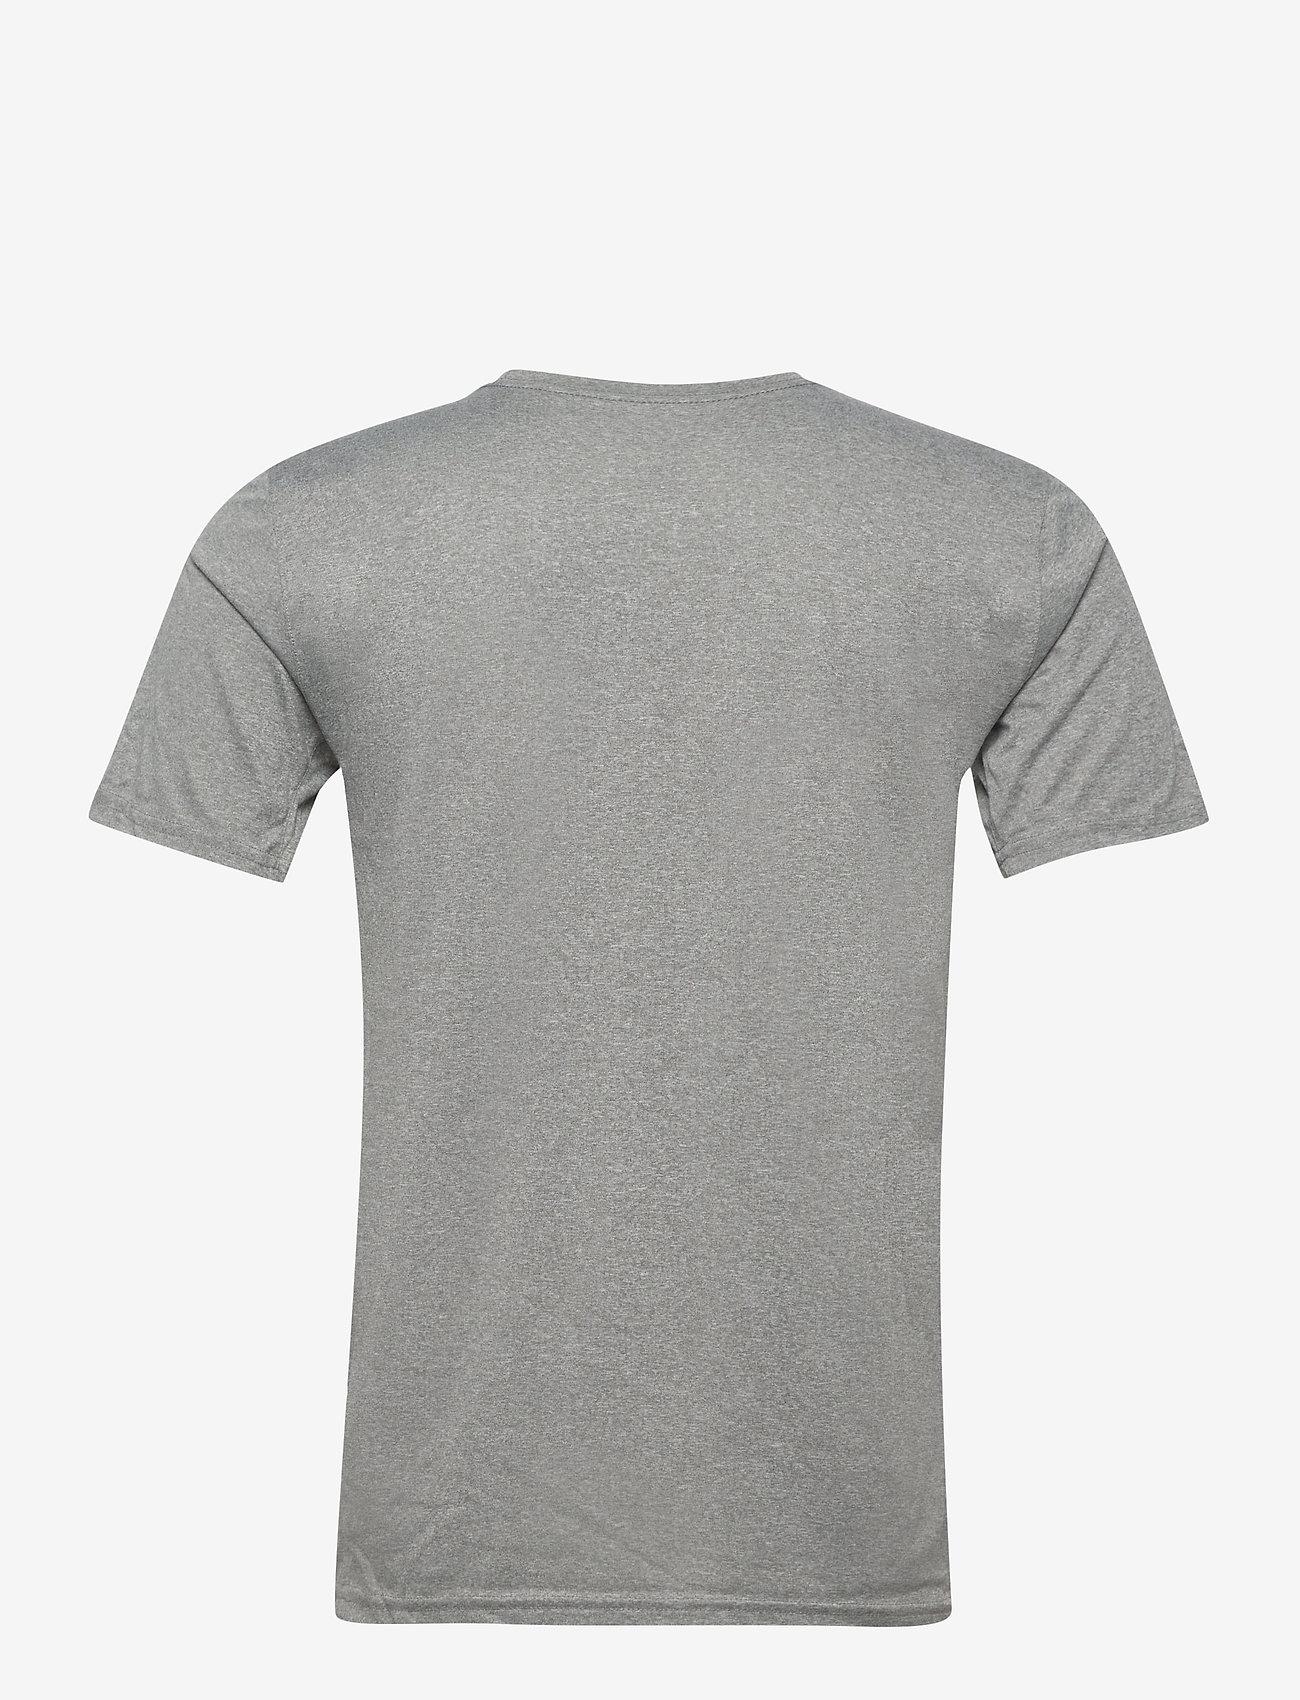 NIKE Fan Gear Pittsburgh Pirates Nike Team Just Do It Legend T-Shirt - T-skjorter DARK GREY HEATHER - Menn Klær